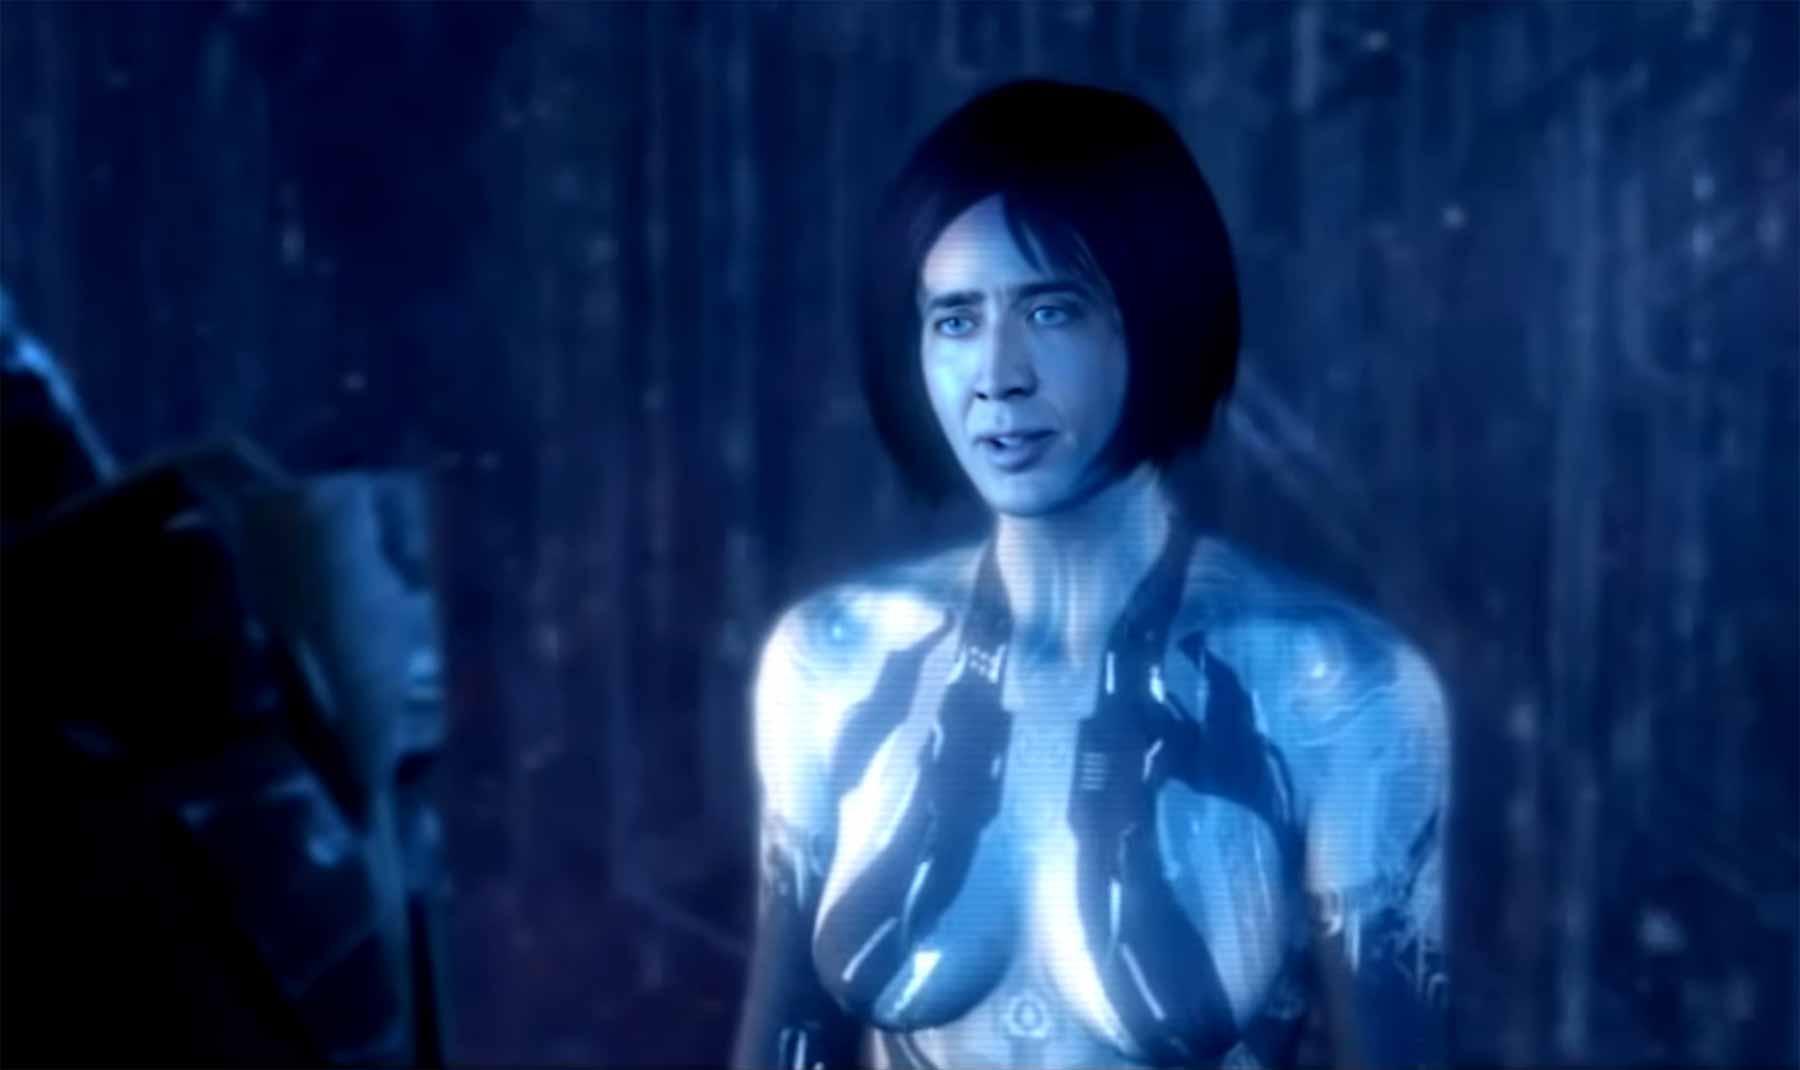 Nicolas Cage per Deepfake in lauter Videospielen